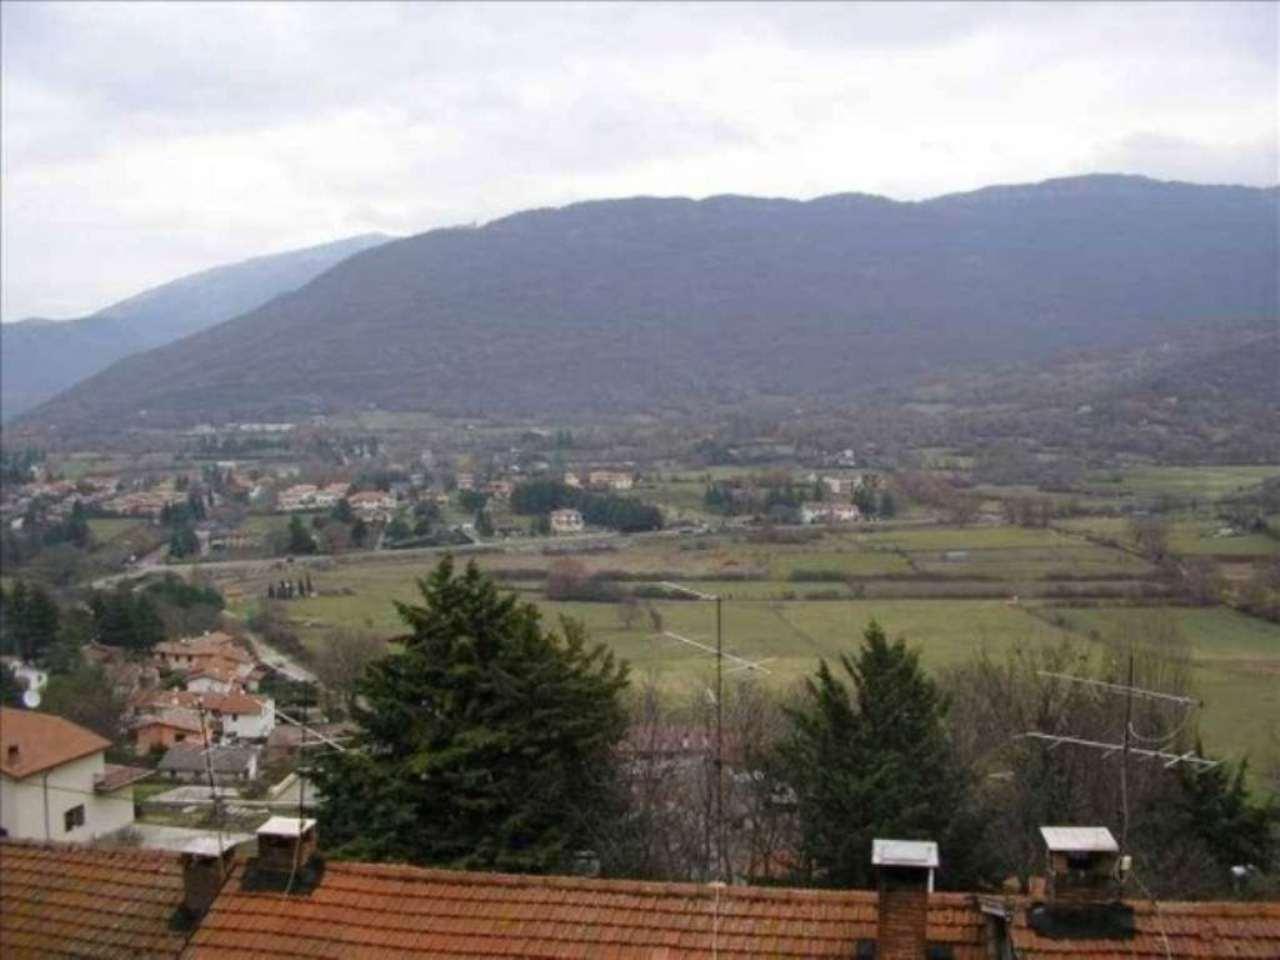 Rocca di Botte Vendita CASALE / RUSTICO / CASA / CASCINA Immagine 3